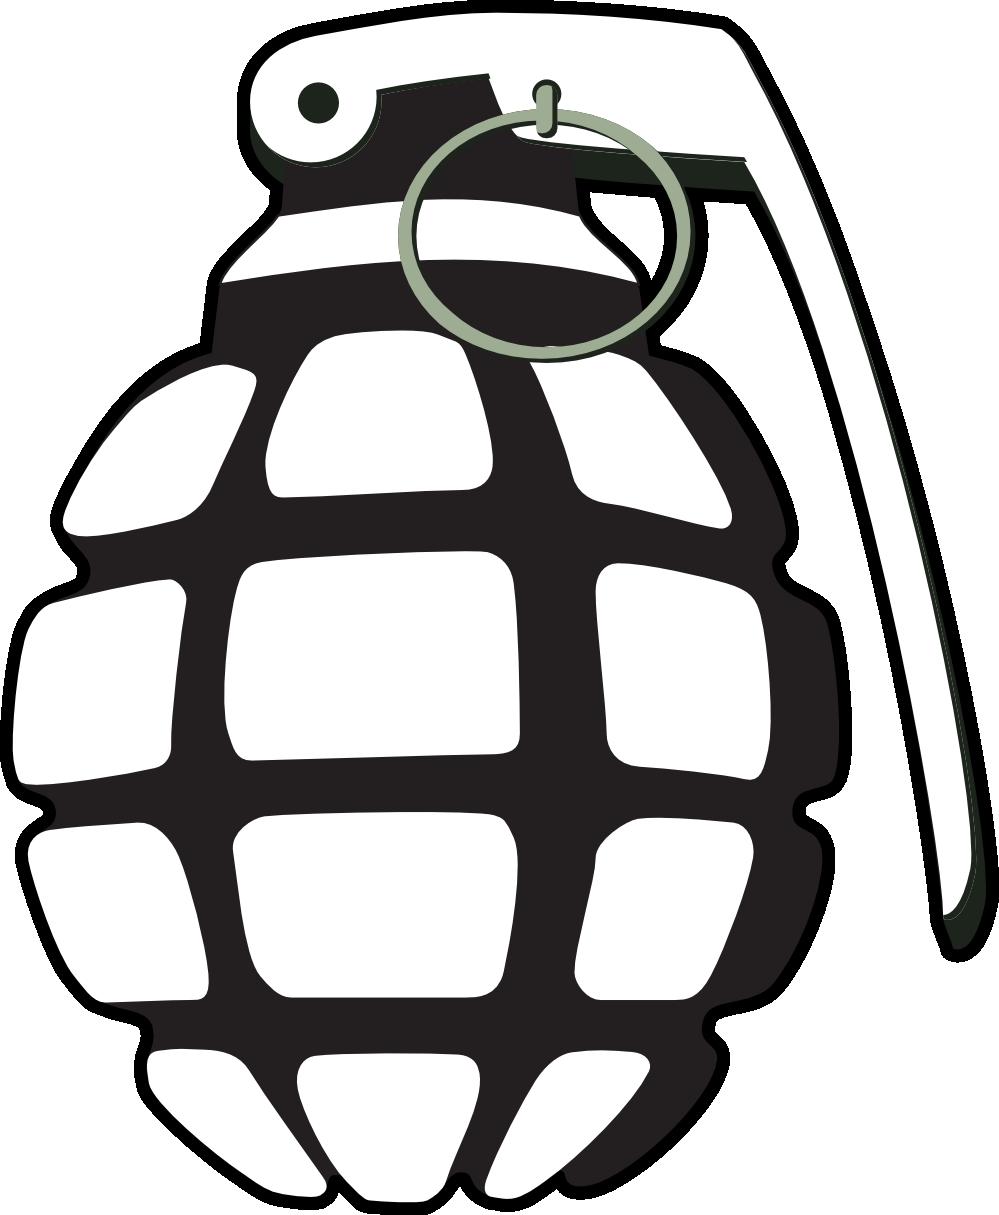 grenade vector clipart best clipart panda free clipart images rh clipartpanda com Bomb Vector Grenade Graphics